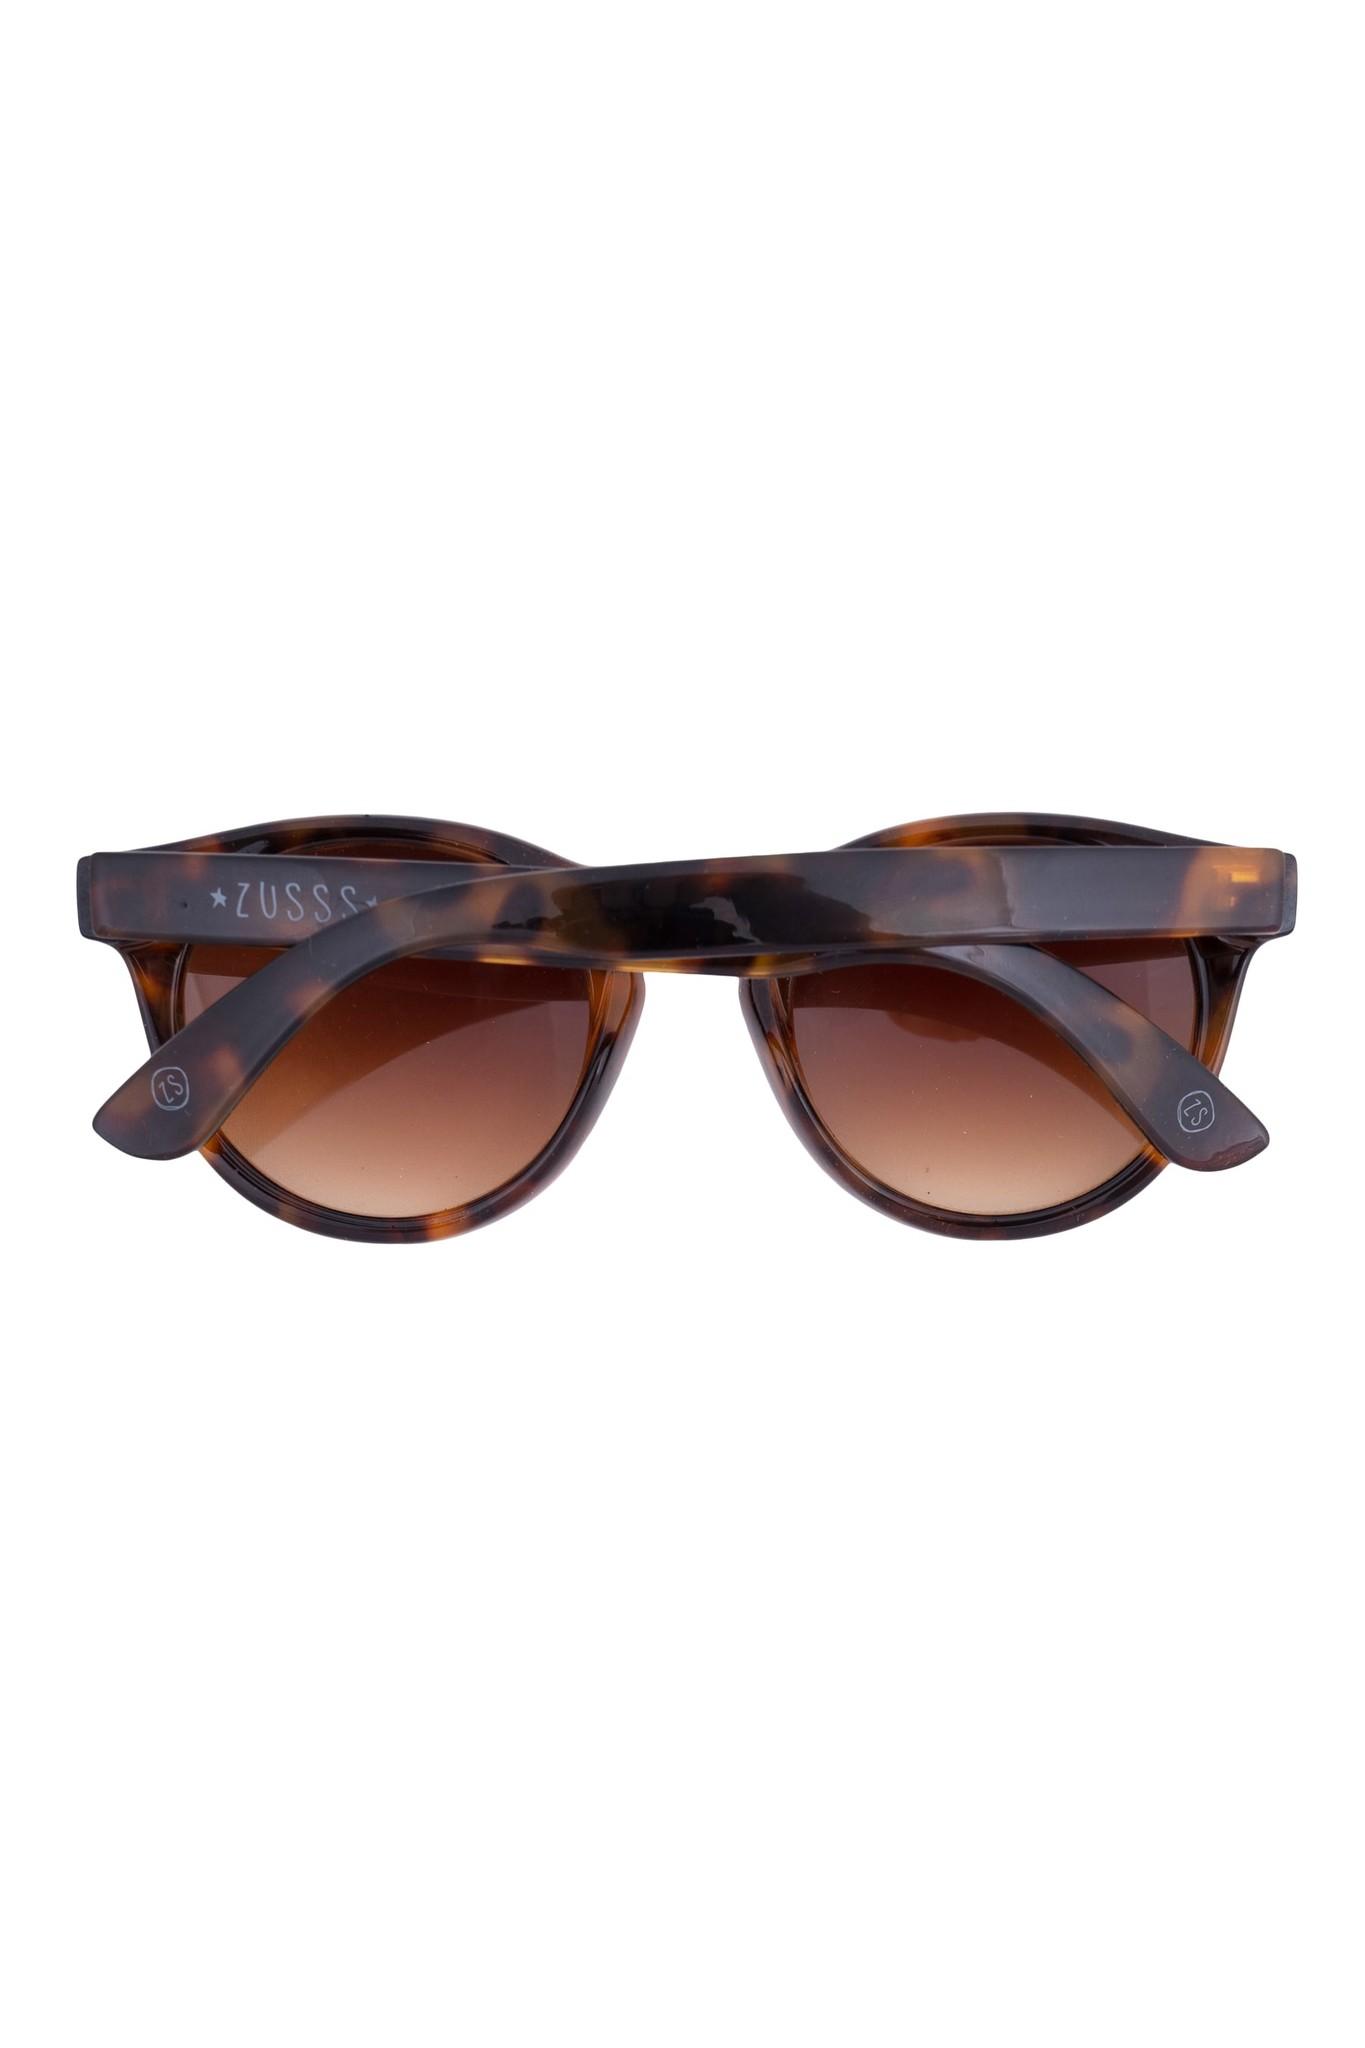 Zusss Sjieke zonnebril gevlekt (2)